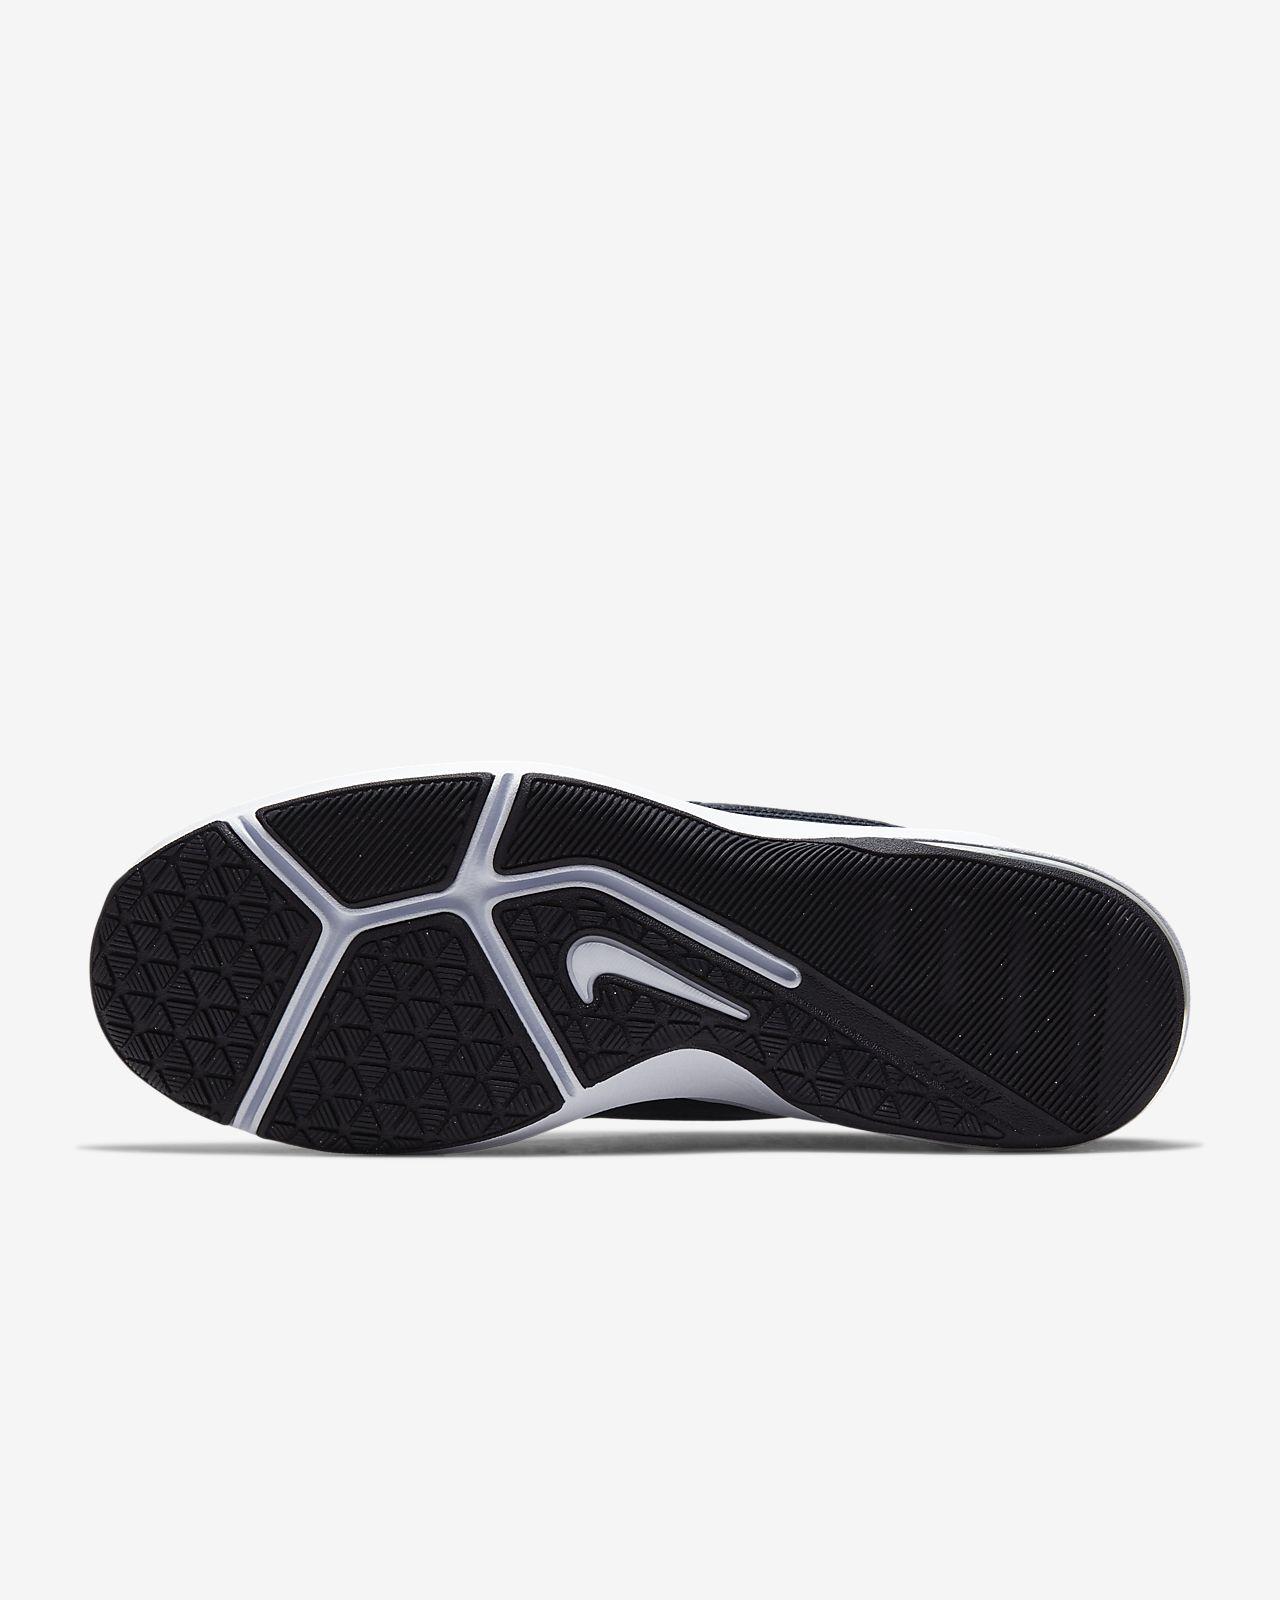 Nike Air Max Alpha Trainer 2 Herren Trainingsschuh